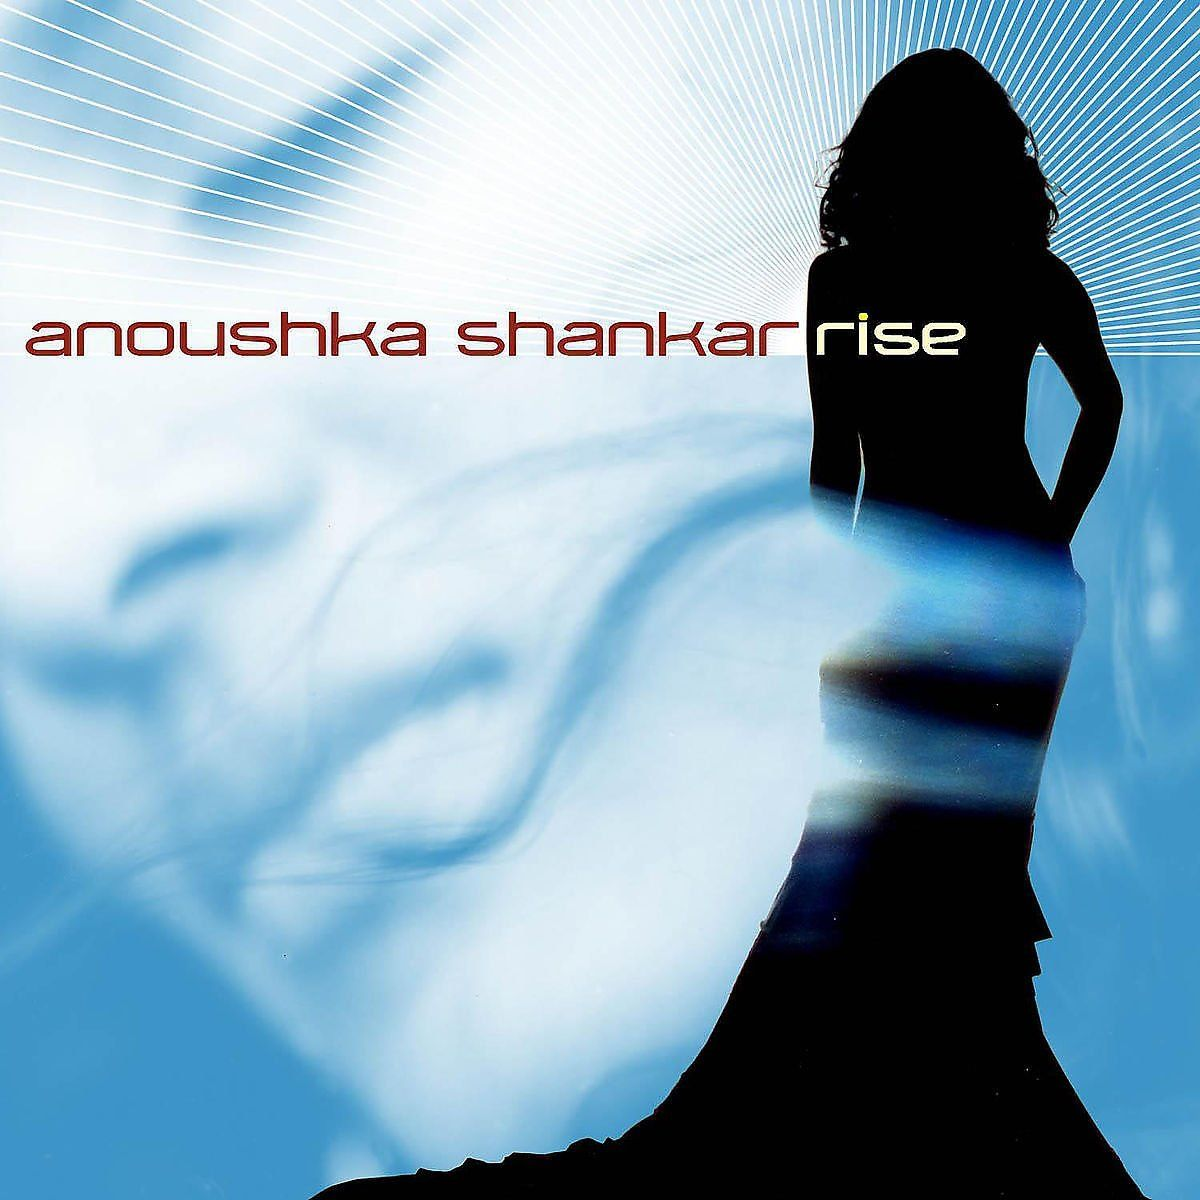 цены на Анушка Шанкар Anoushka Shankar. Rise  в интернет-магазинах